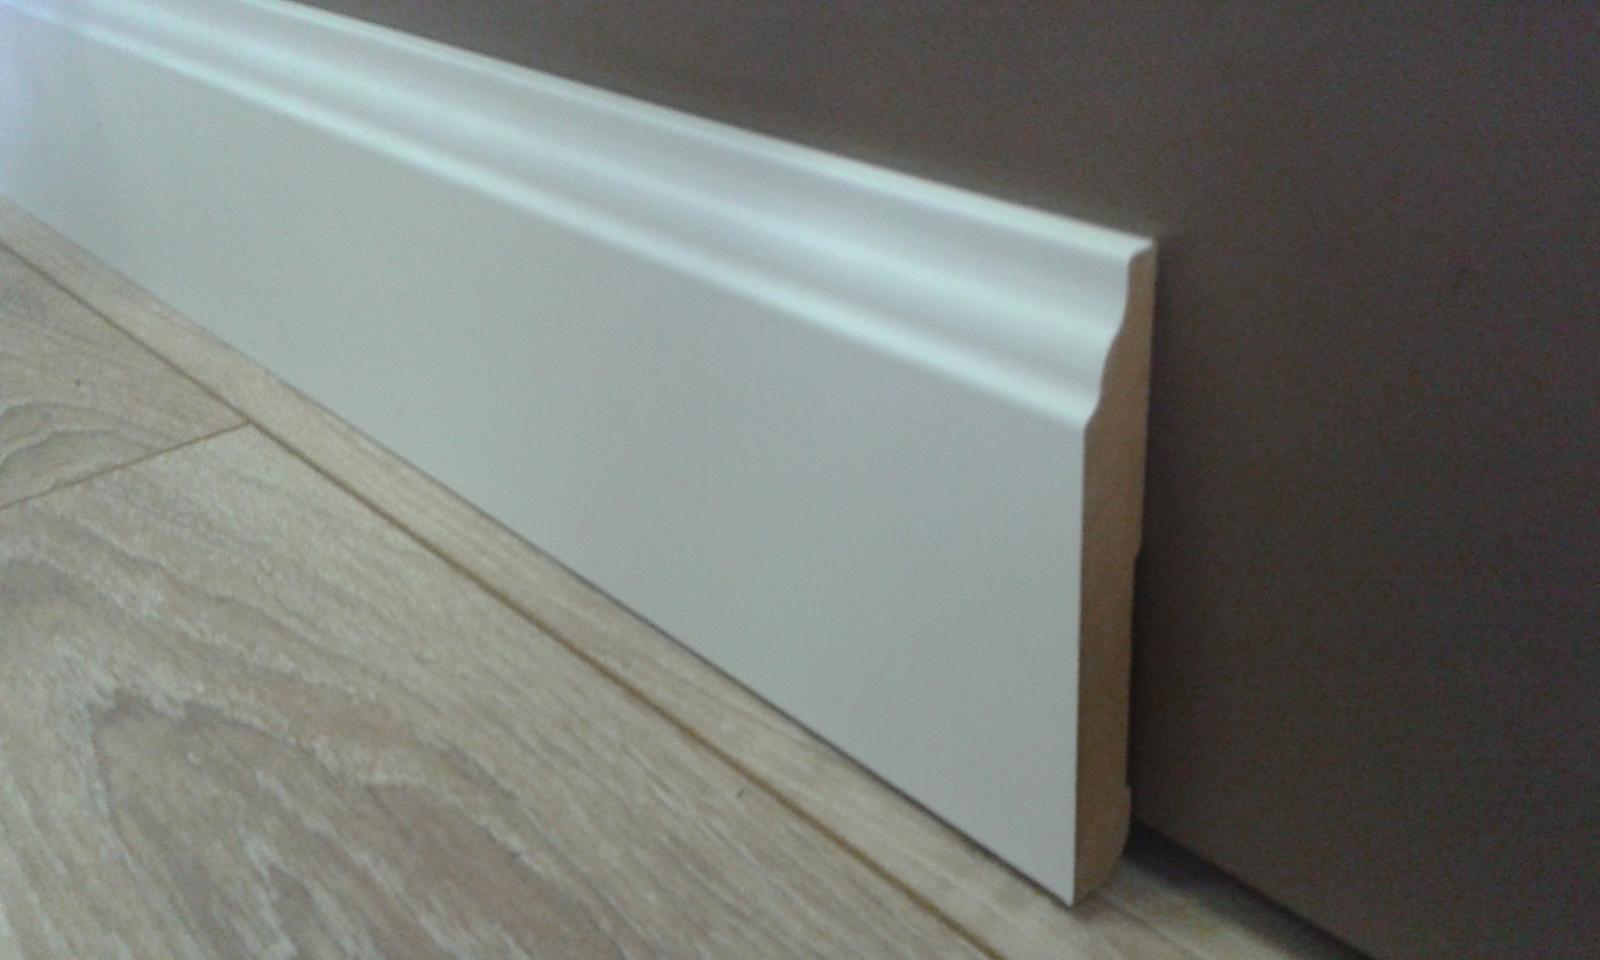 Vysoké biele lišty - vysoká anglická lišta - dĺžka 2,4m , výška 11cm , šírka 1,4cm. Materiál MDF potiahnutý fóliou.